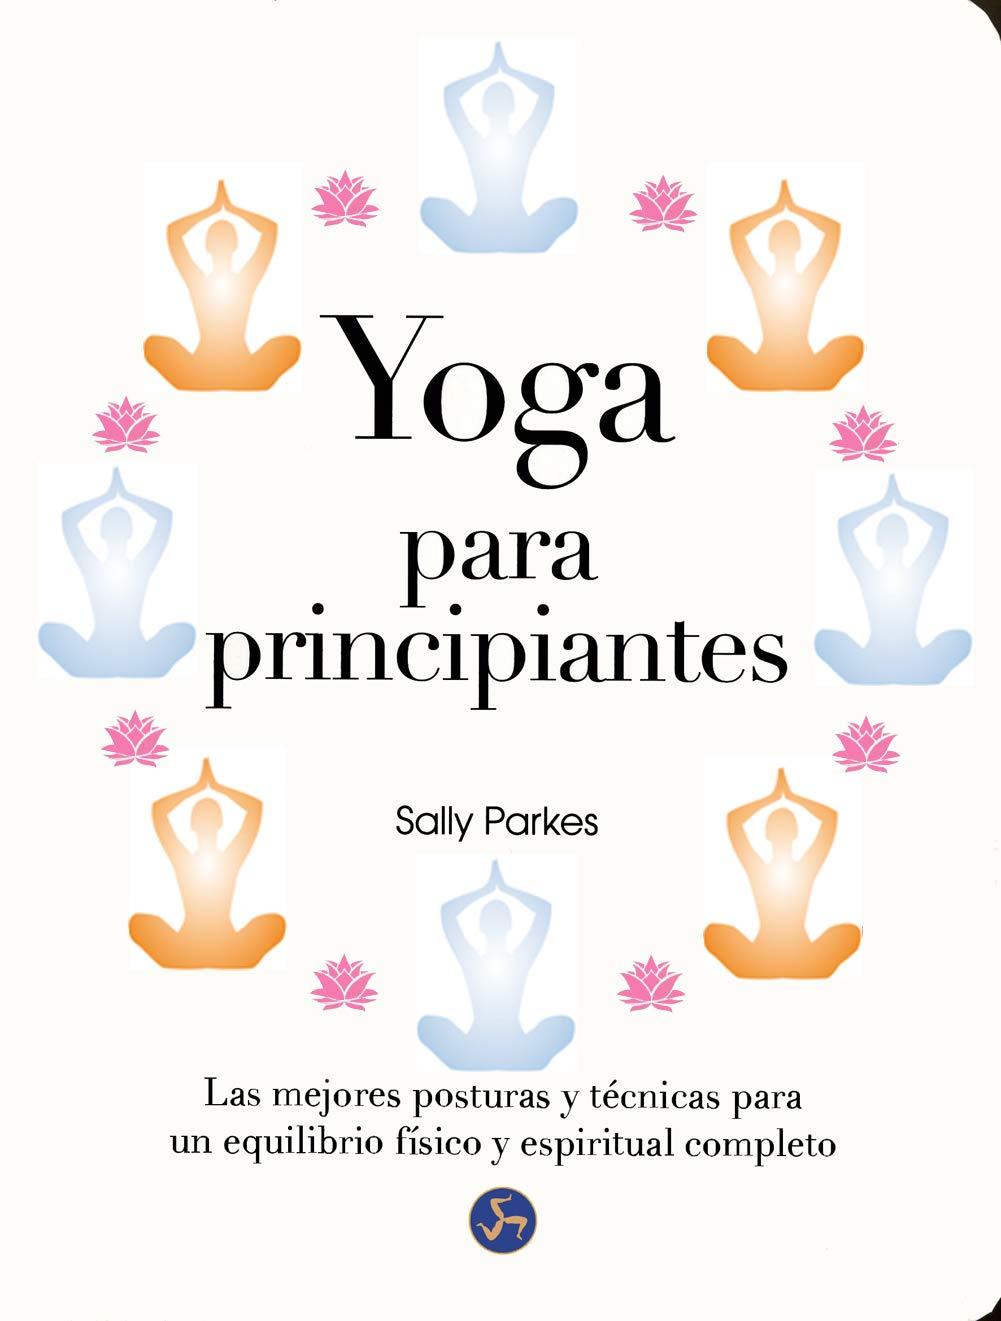 Yoga para principiantes de Sally Parkes